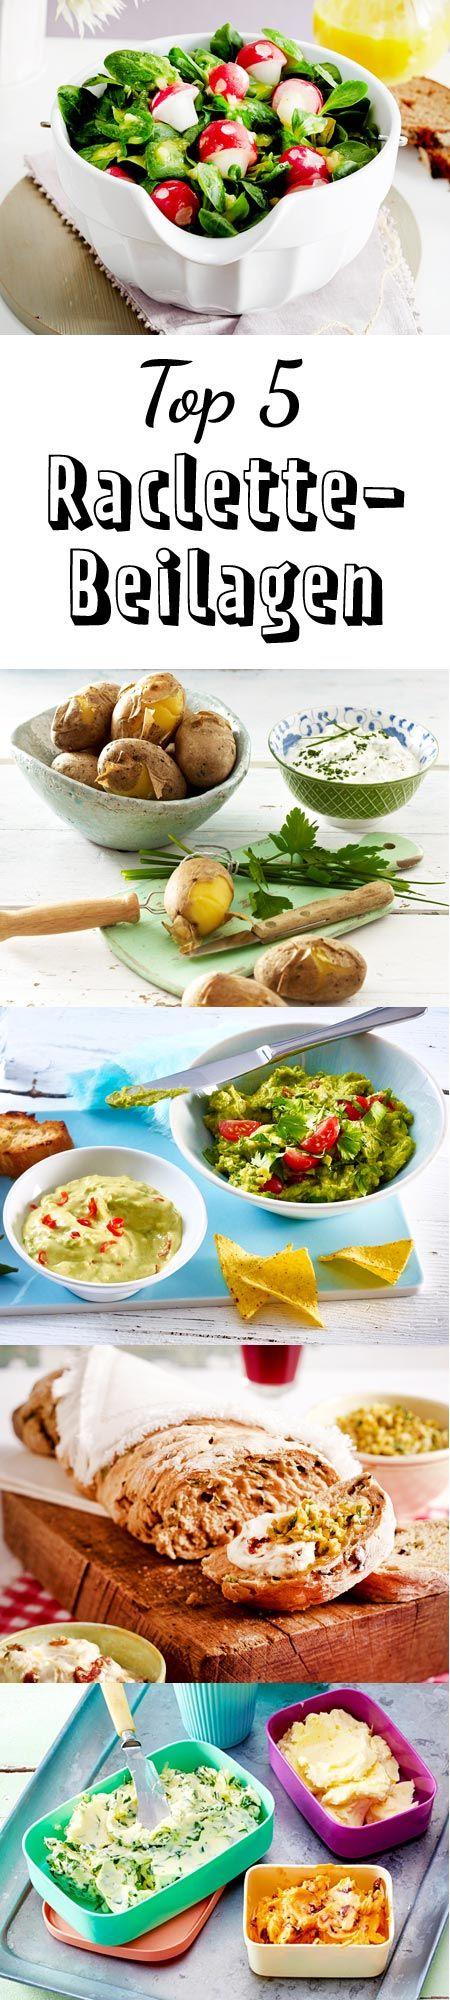 Salate, Dips und Co. #raclette #weihnachten #silvester